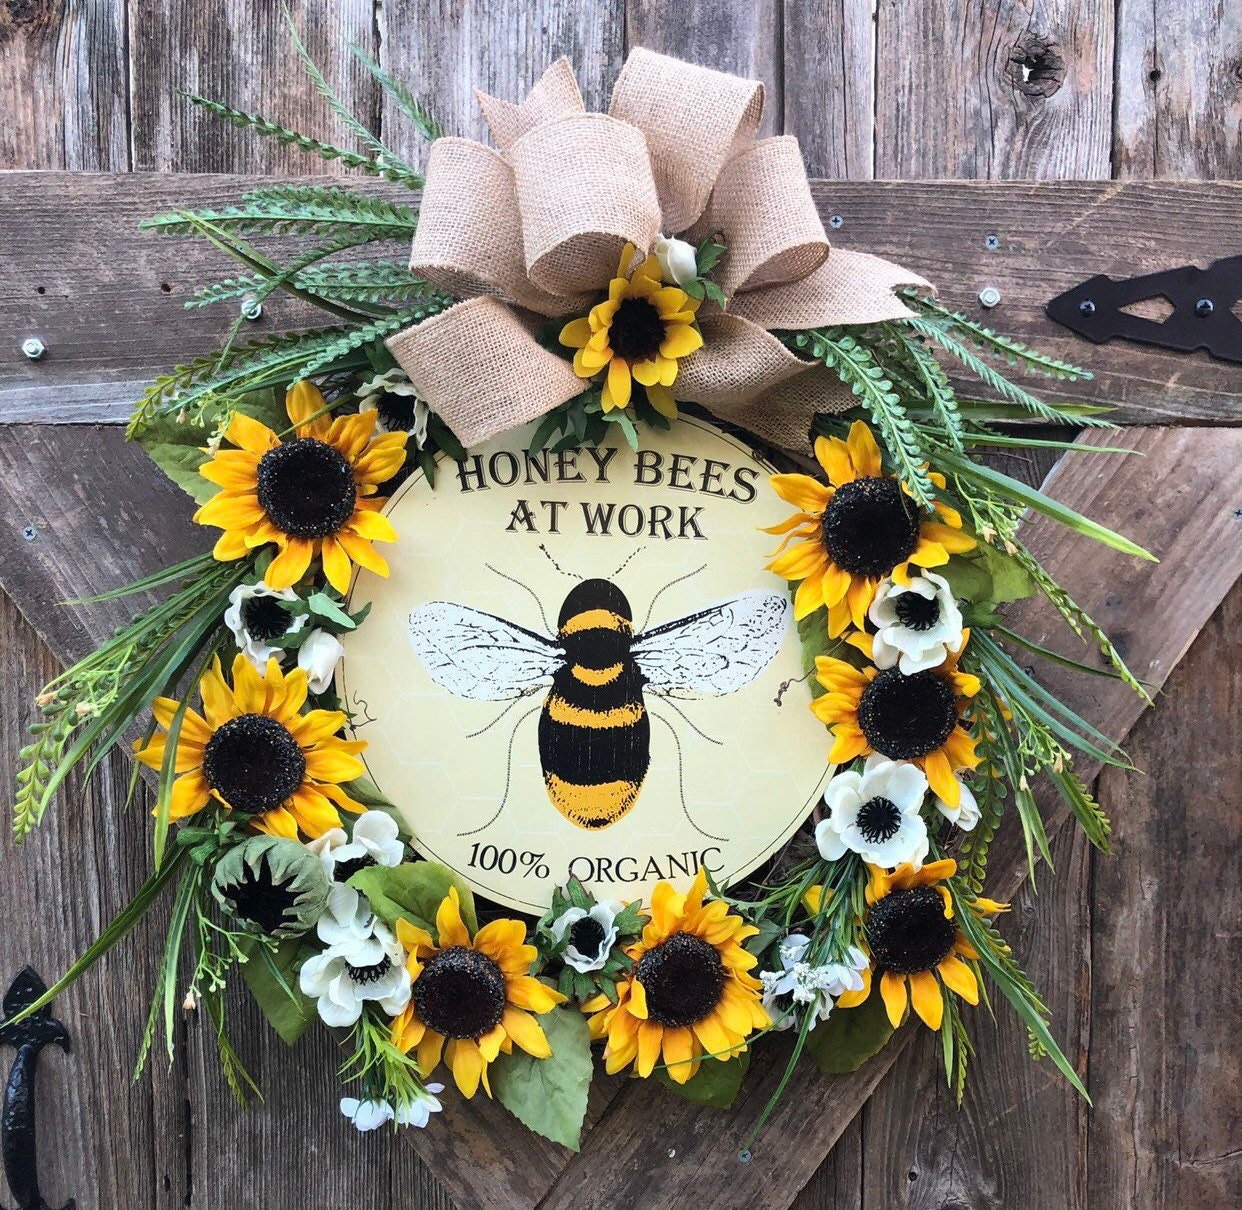 Bee Sunflower Grapevine Wreath Sunflower Bee Wreath Organic Bee Aign Wreath Summer Wreath Sunflower Poopy Wreath